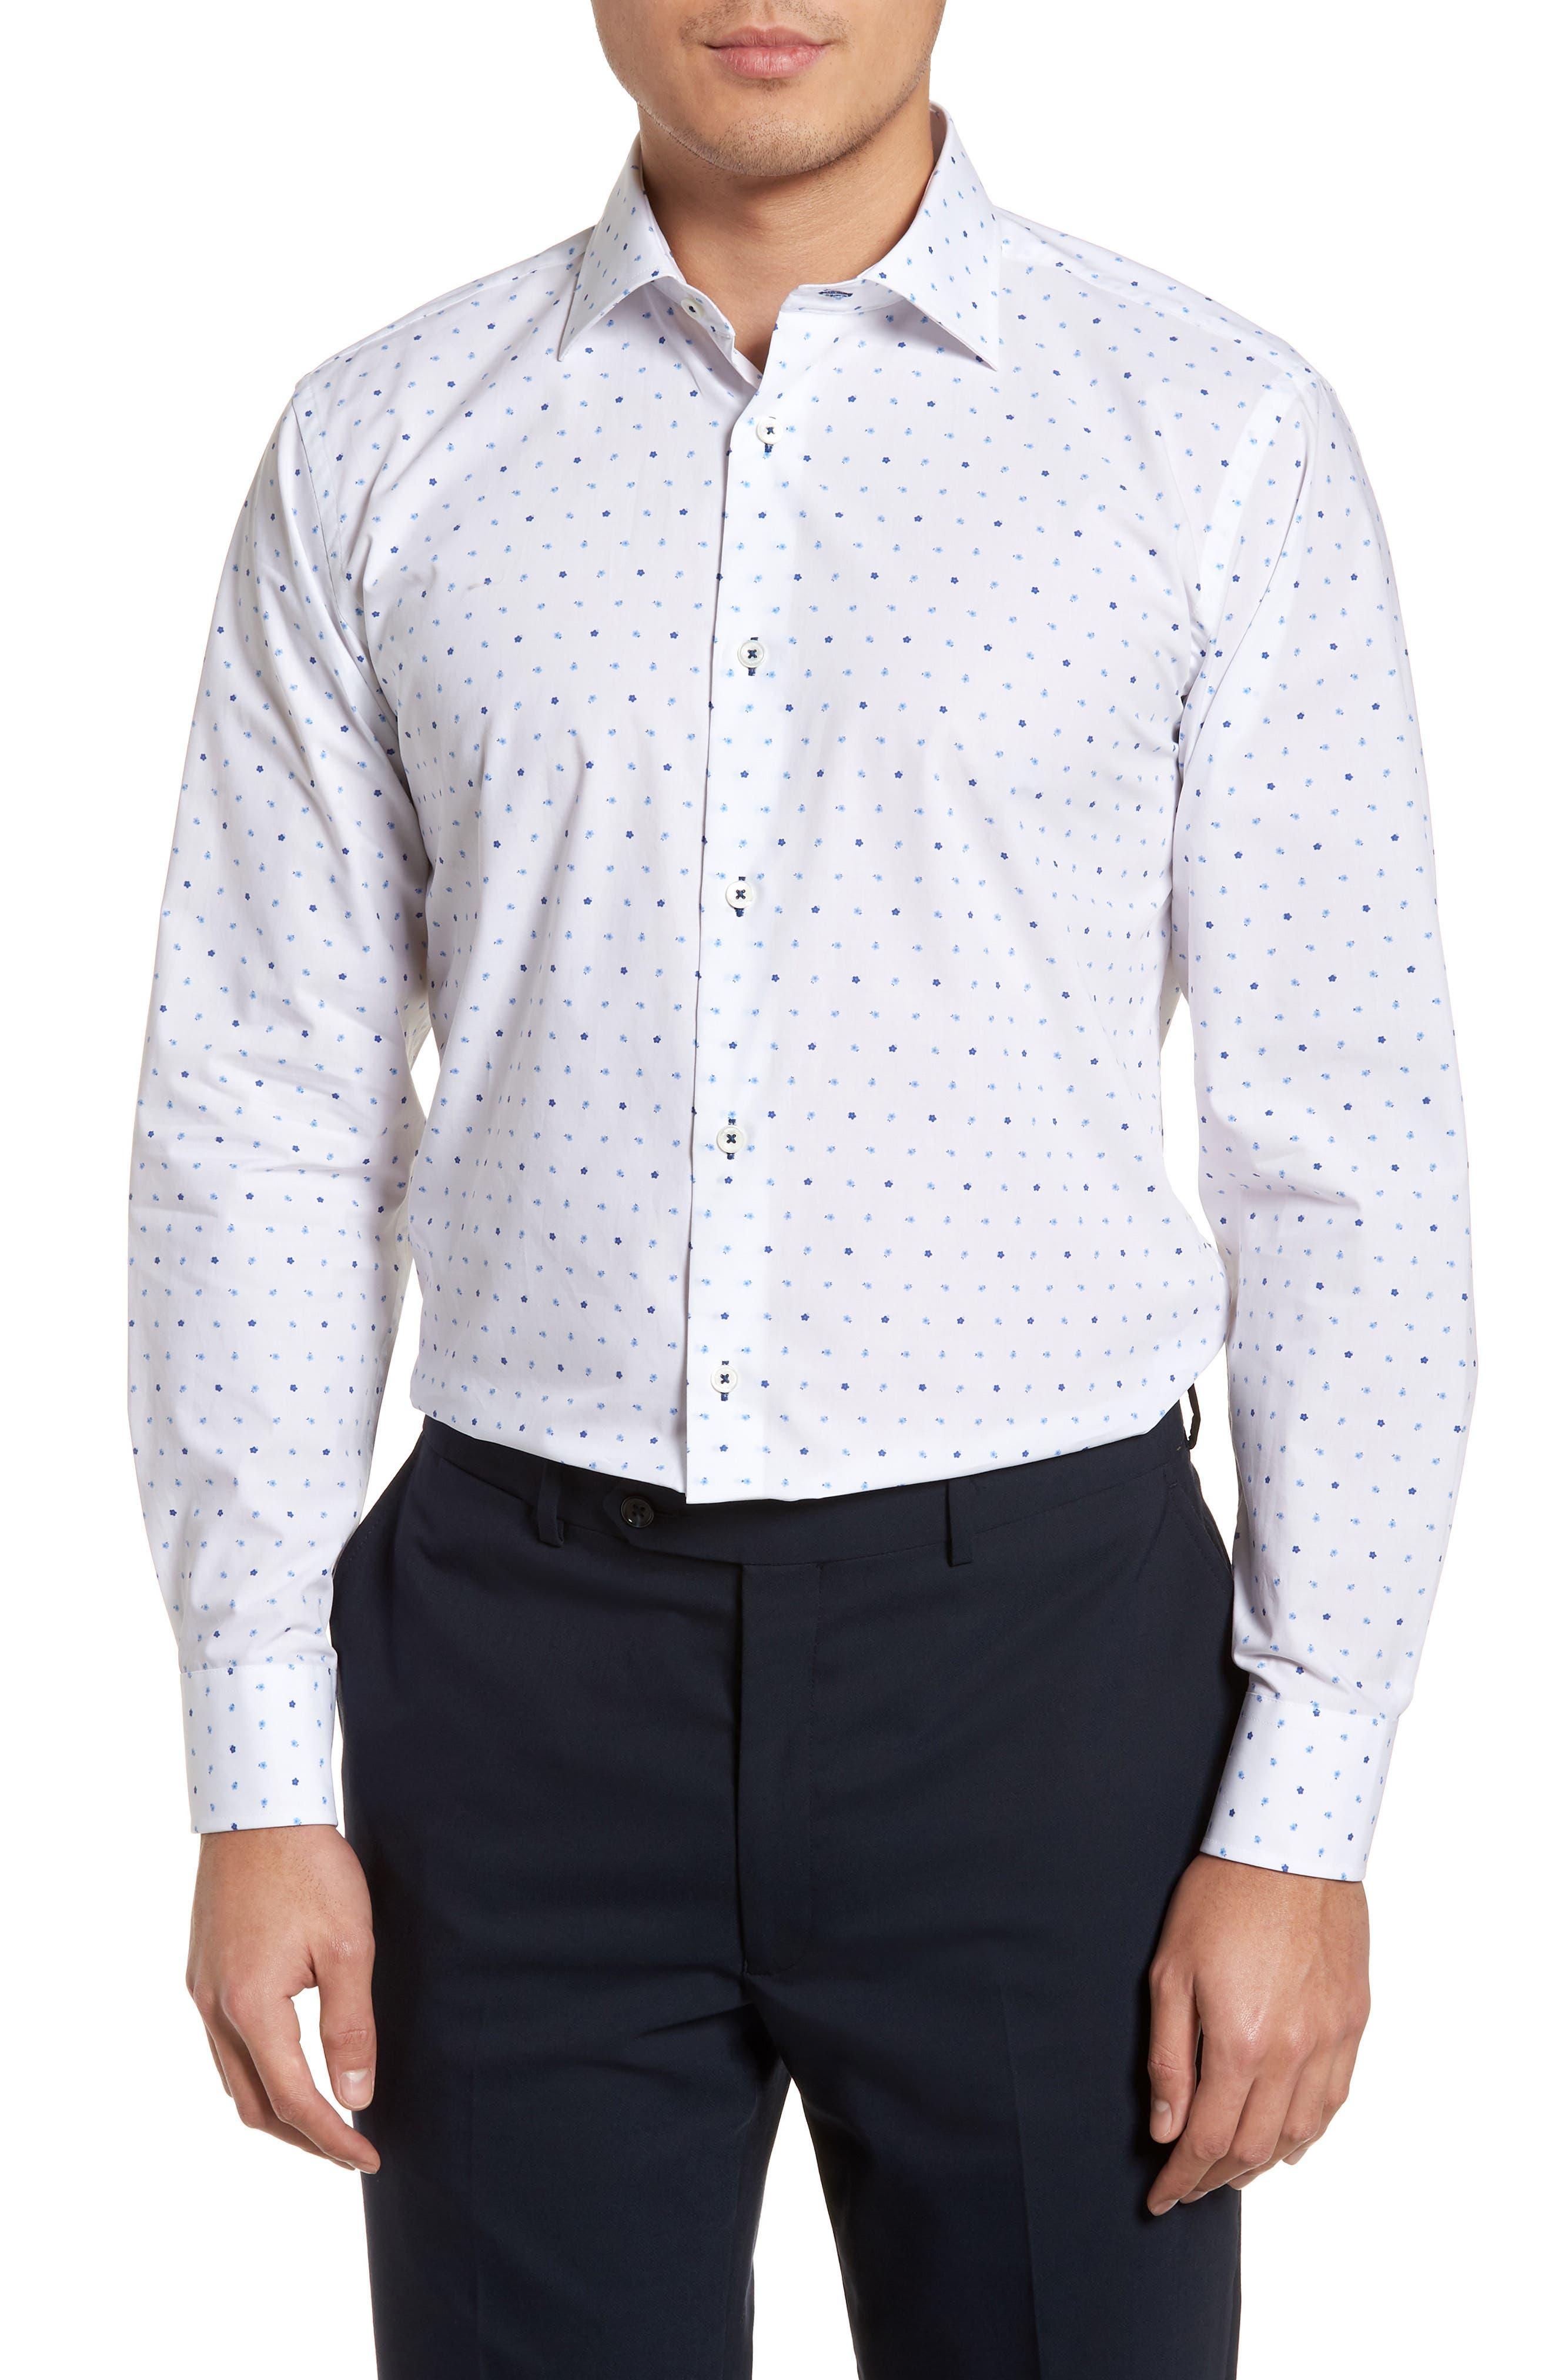 Trim Fit Print Dress Shirt,                             Main thumbnail 1, color,                             CLASSIC BLUE/ WHITE